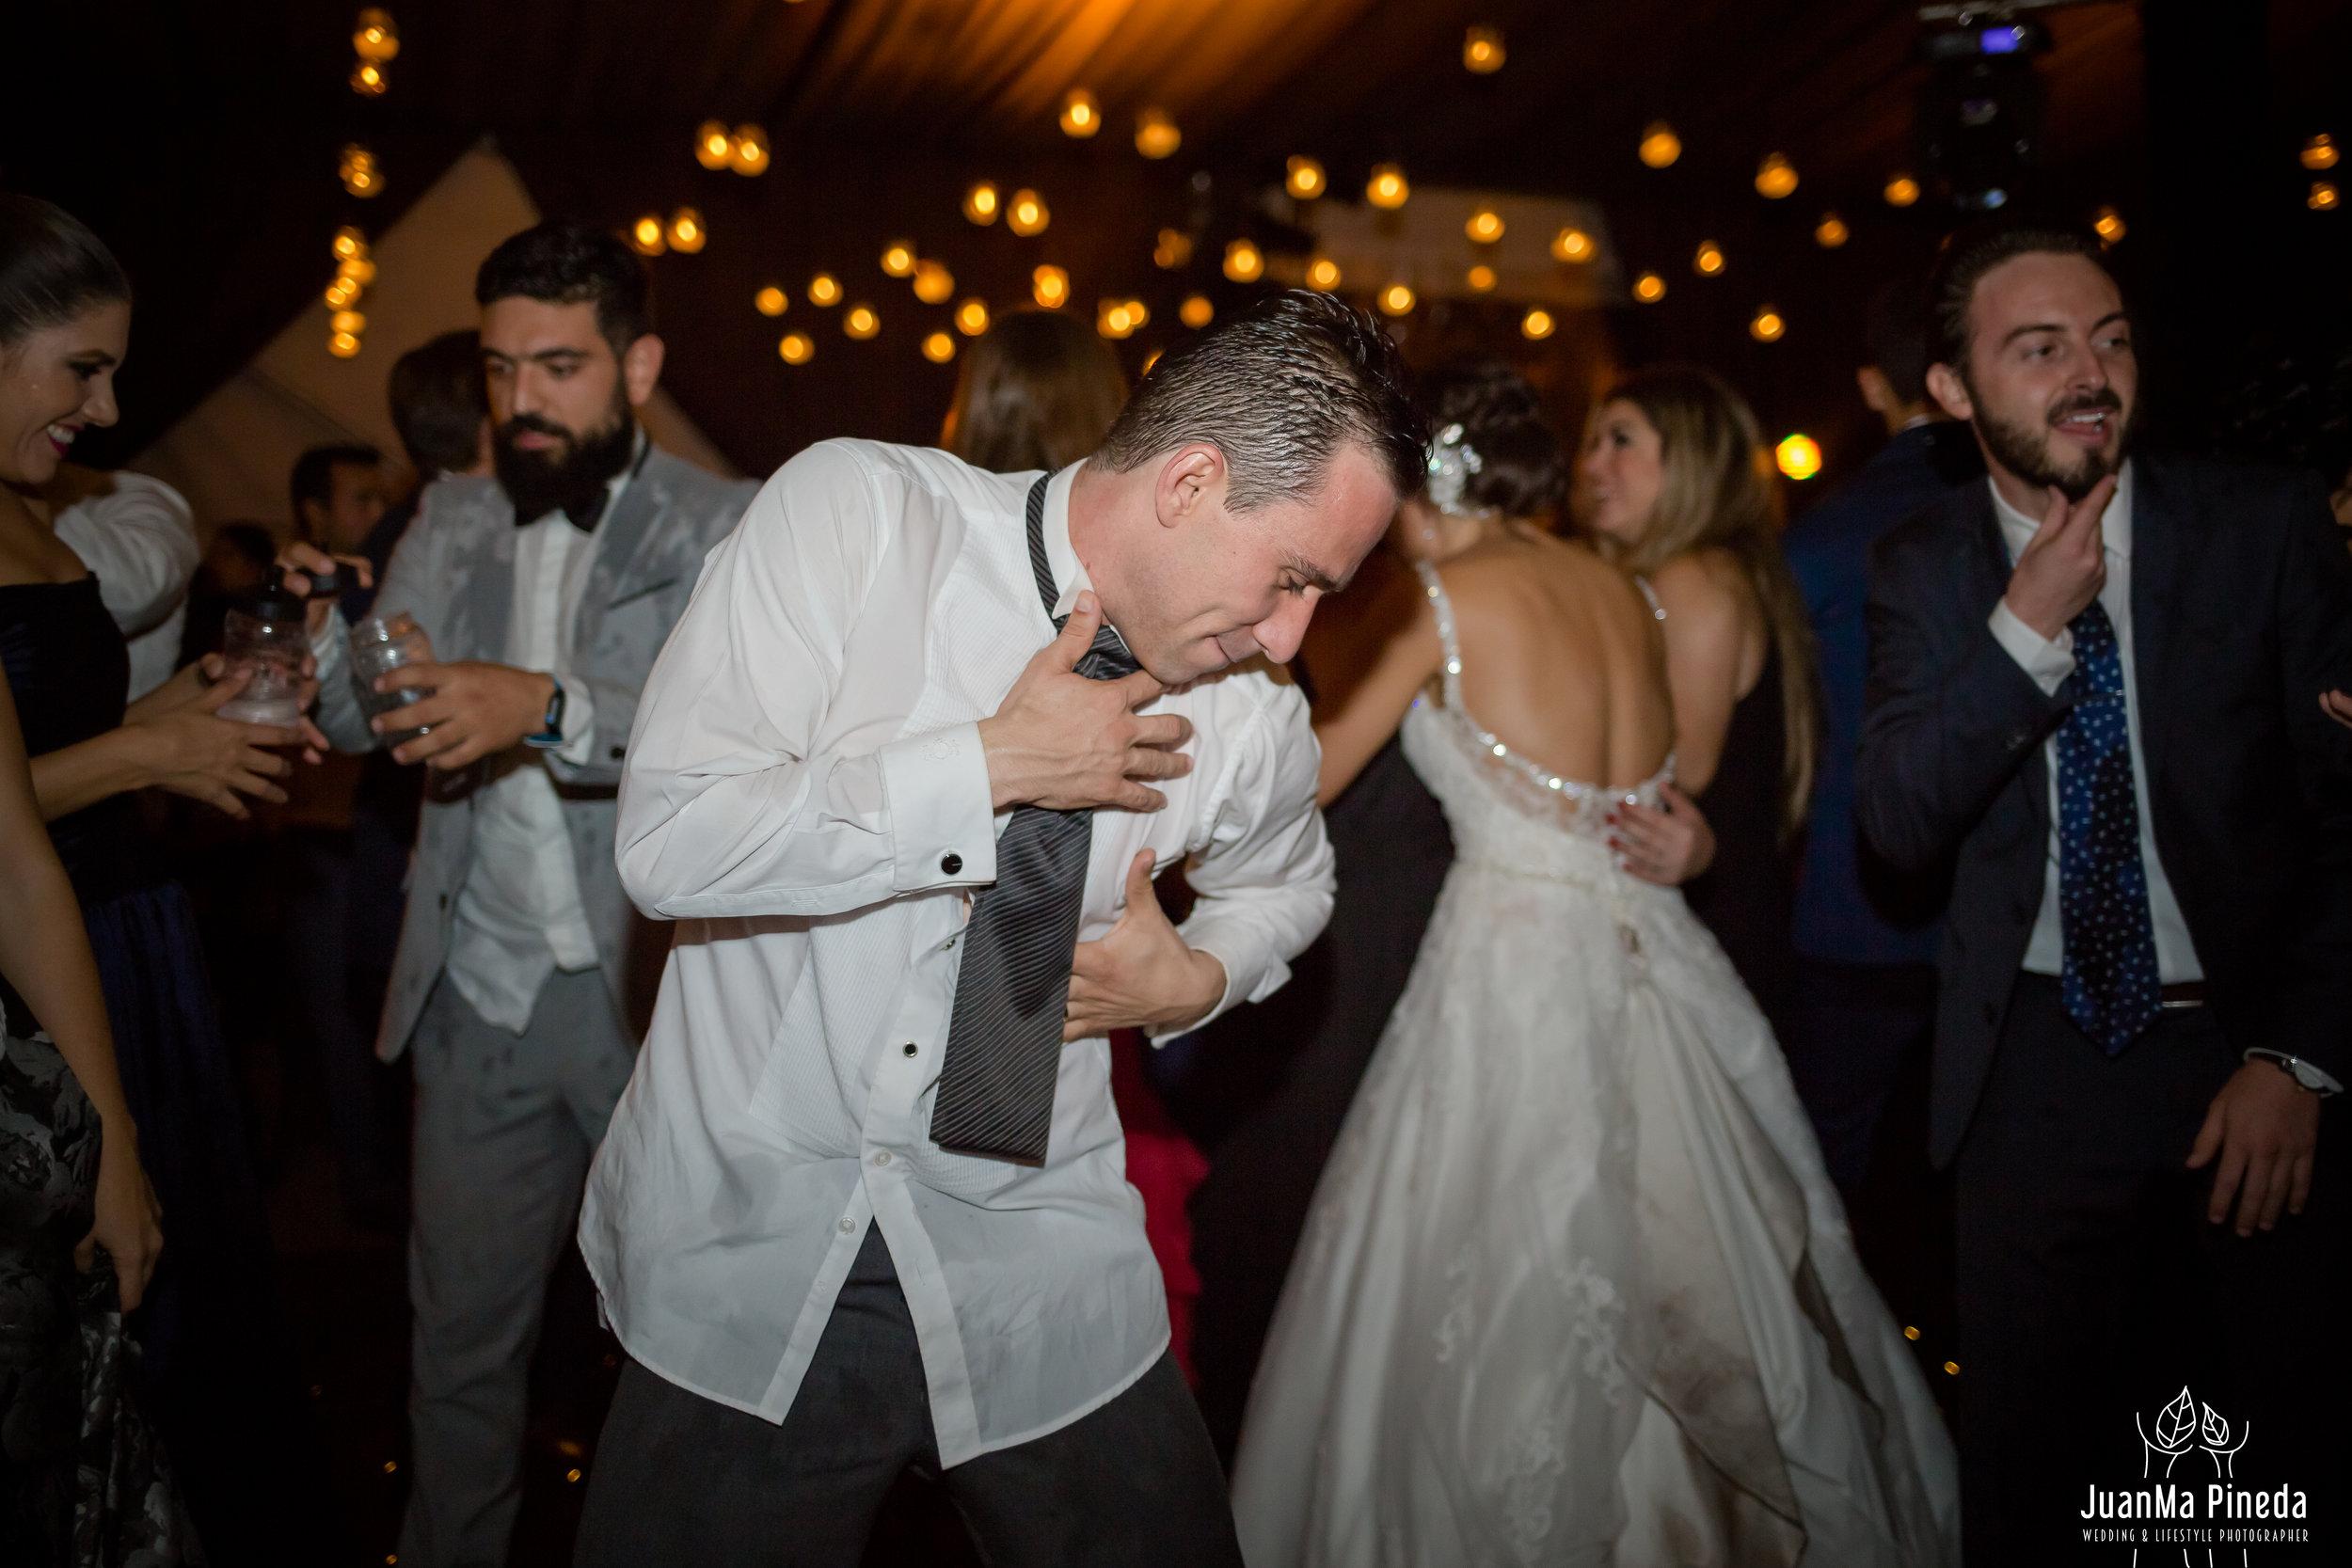 Wedding+Day+Photographer-1-21.jpg